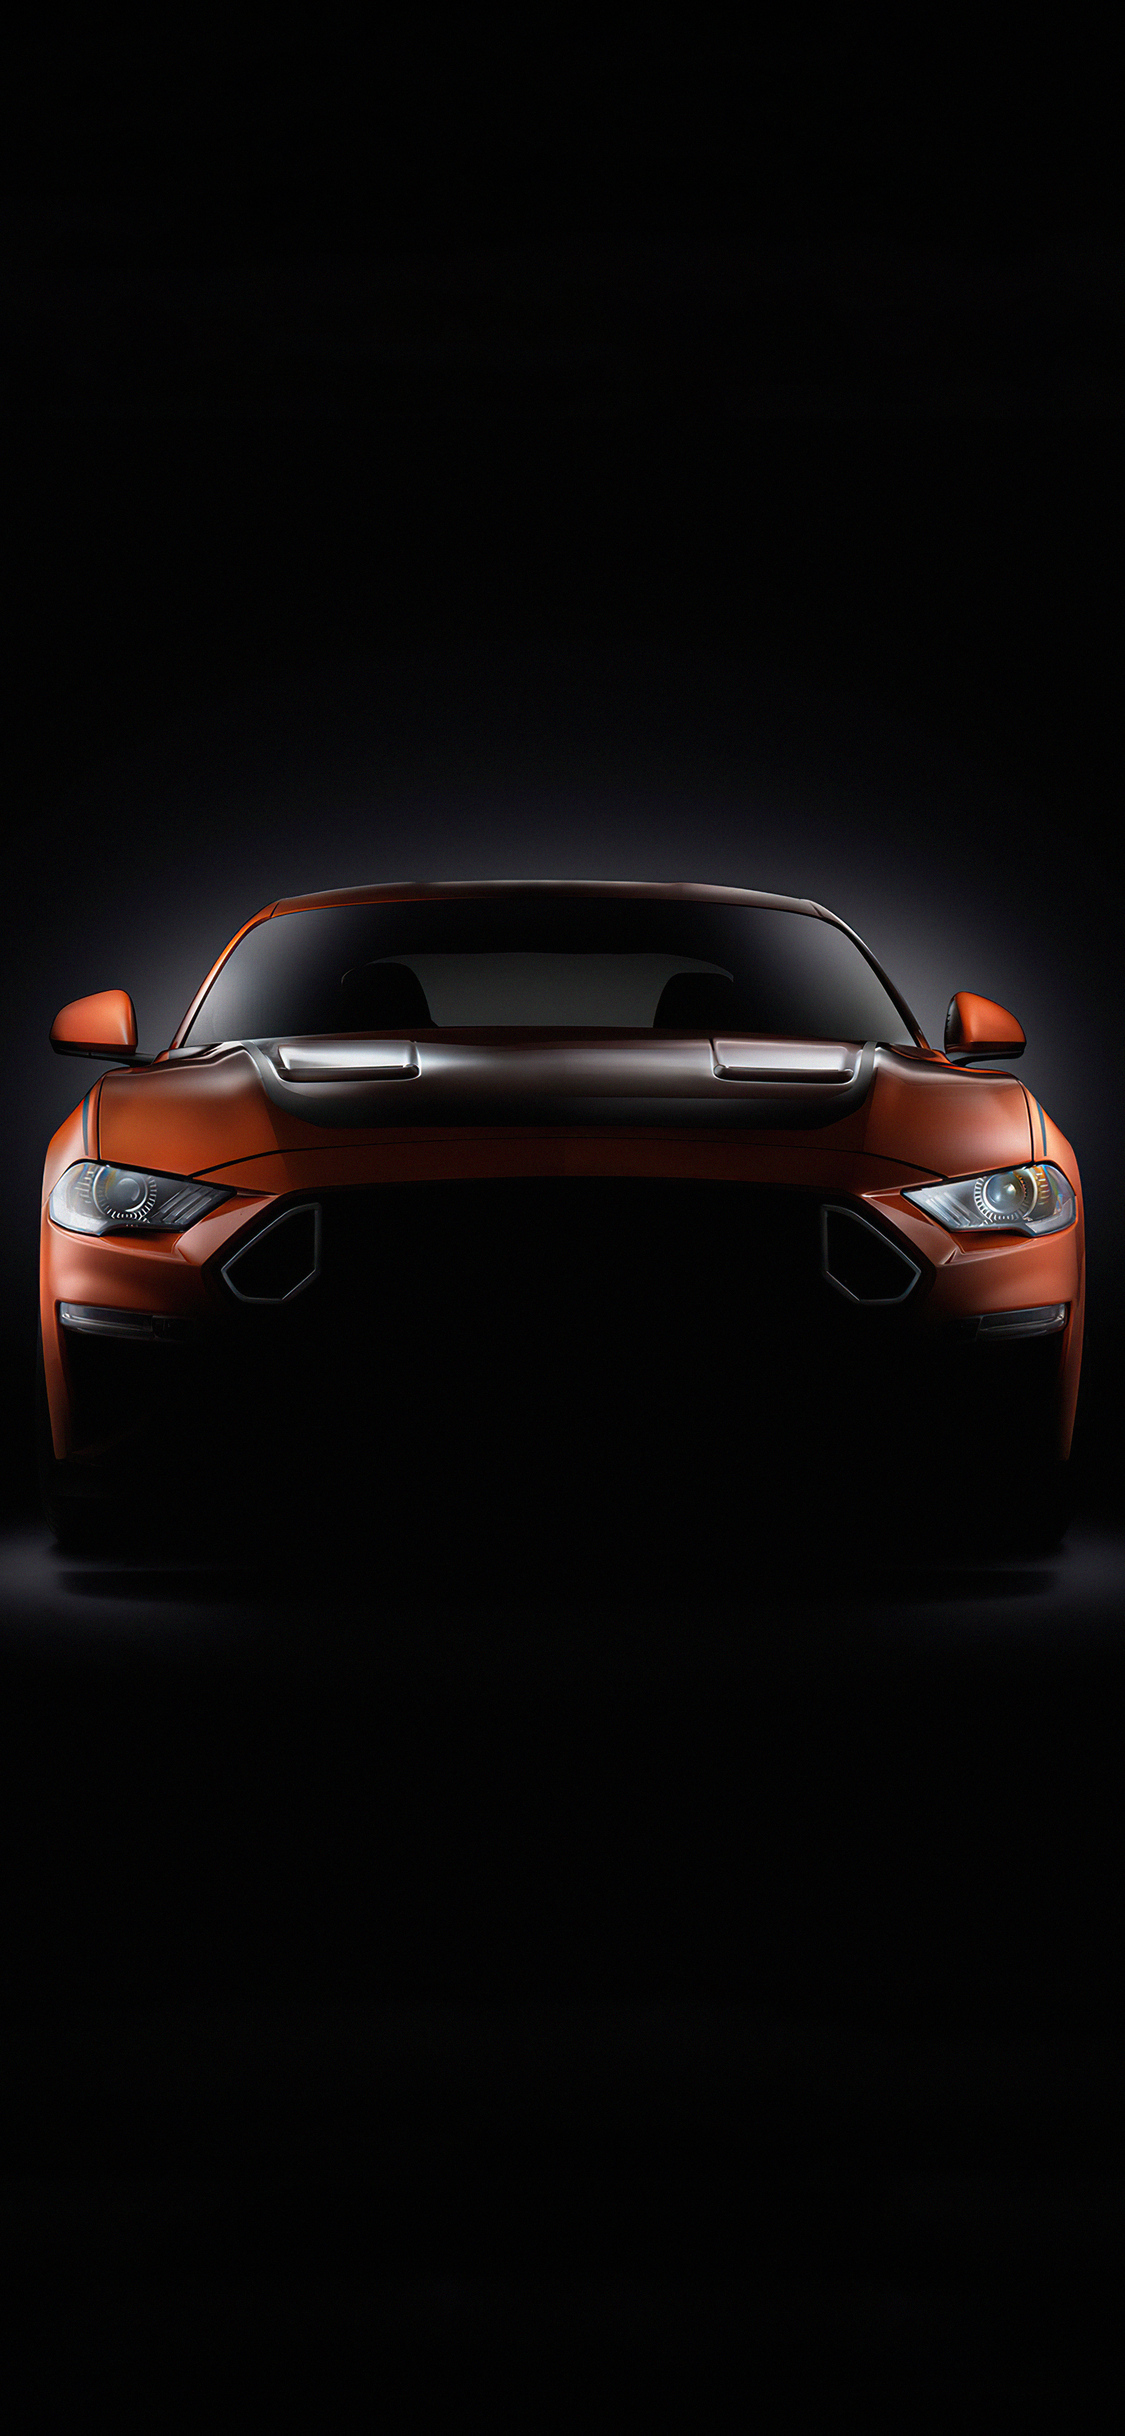 ford-mustang-rtr-performance-4k-s9.jpg